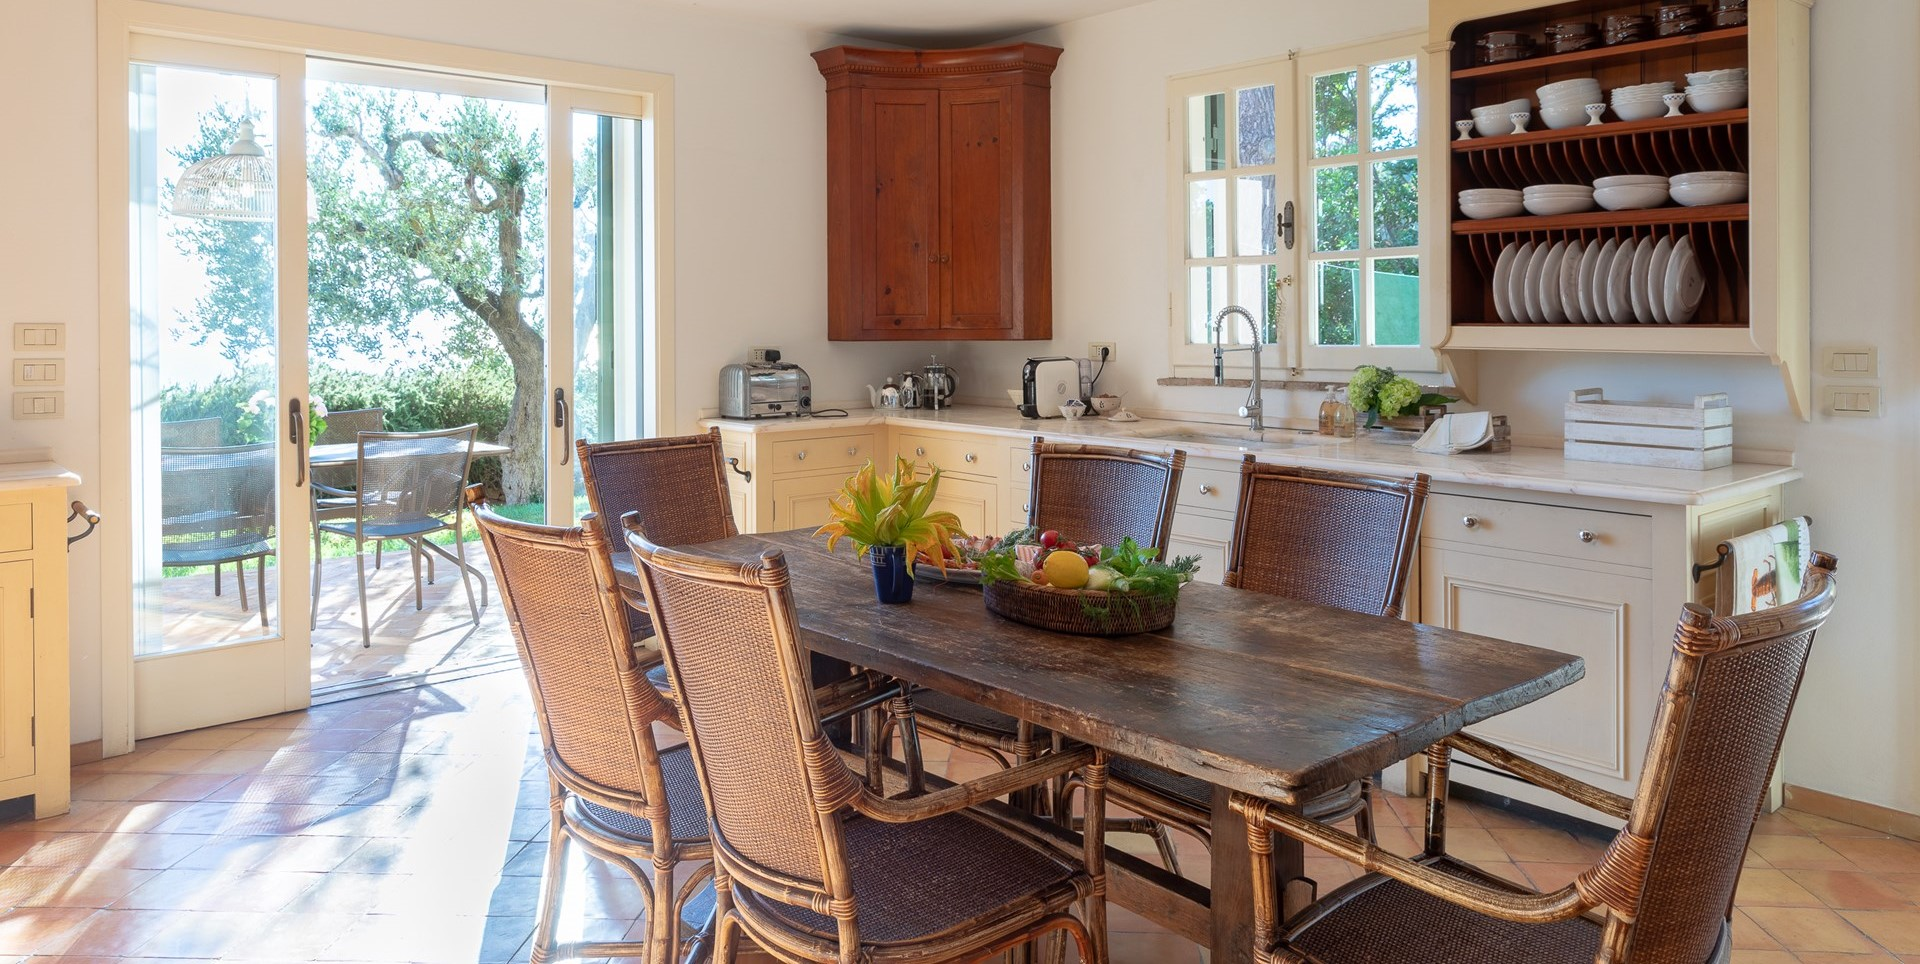 villa-vista-giglio-tuscany-kitchen